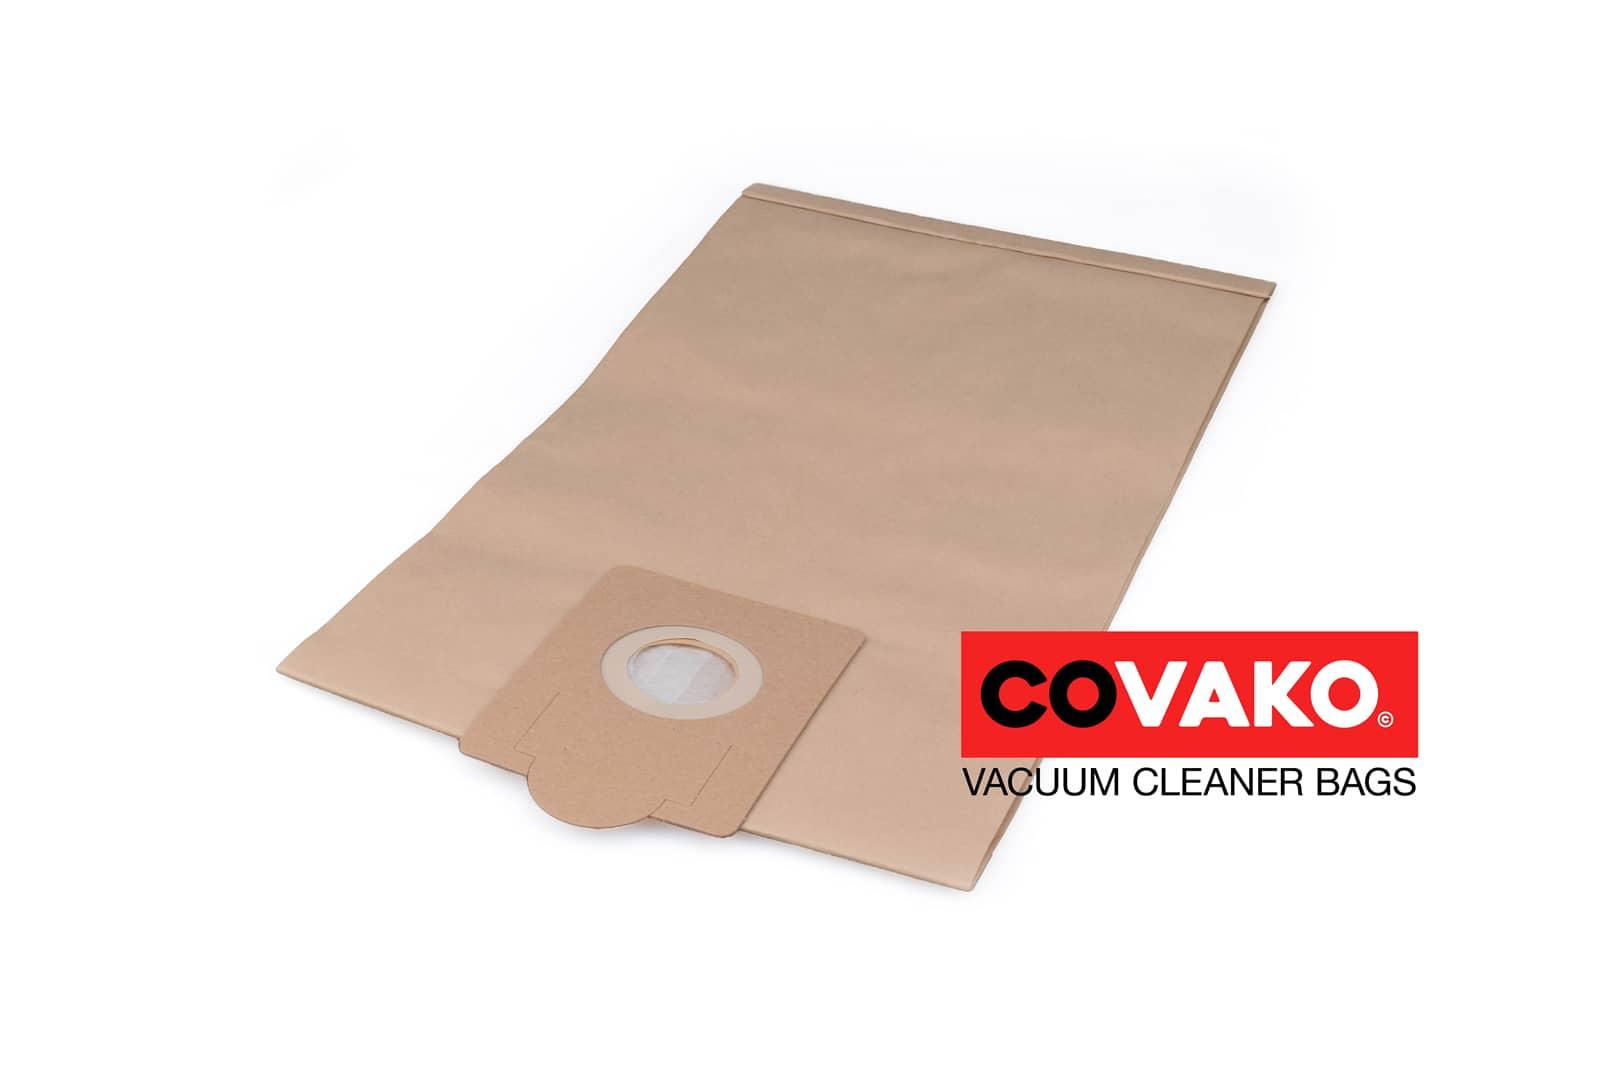 Hako Clean 7231 / Papier - Hako sacs d'aspirateur